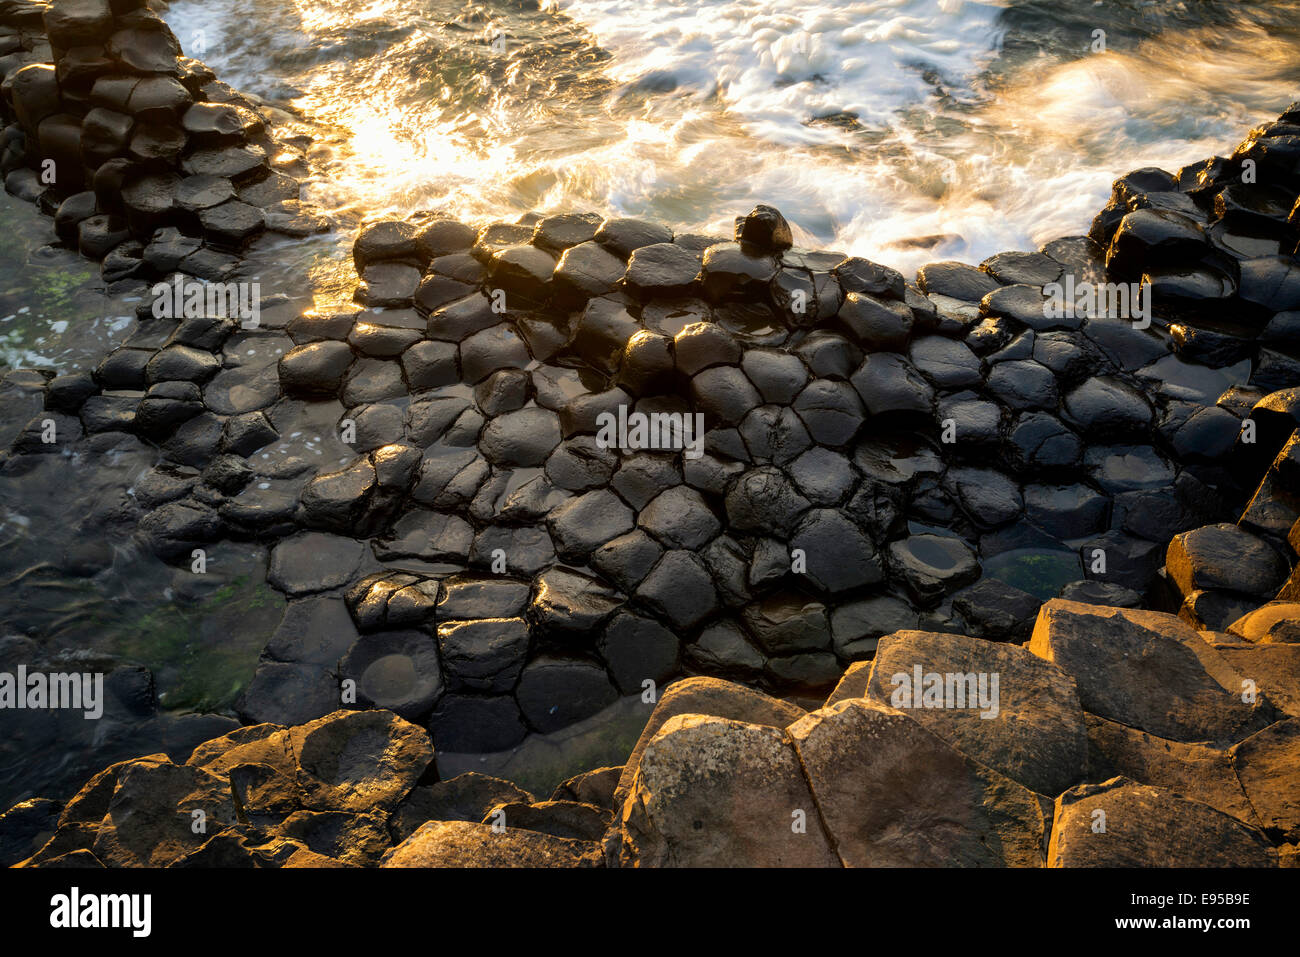 The Giants Causeway, Co, Antrim, Northern Ireland - Stock Image